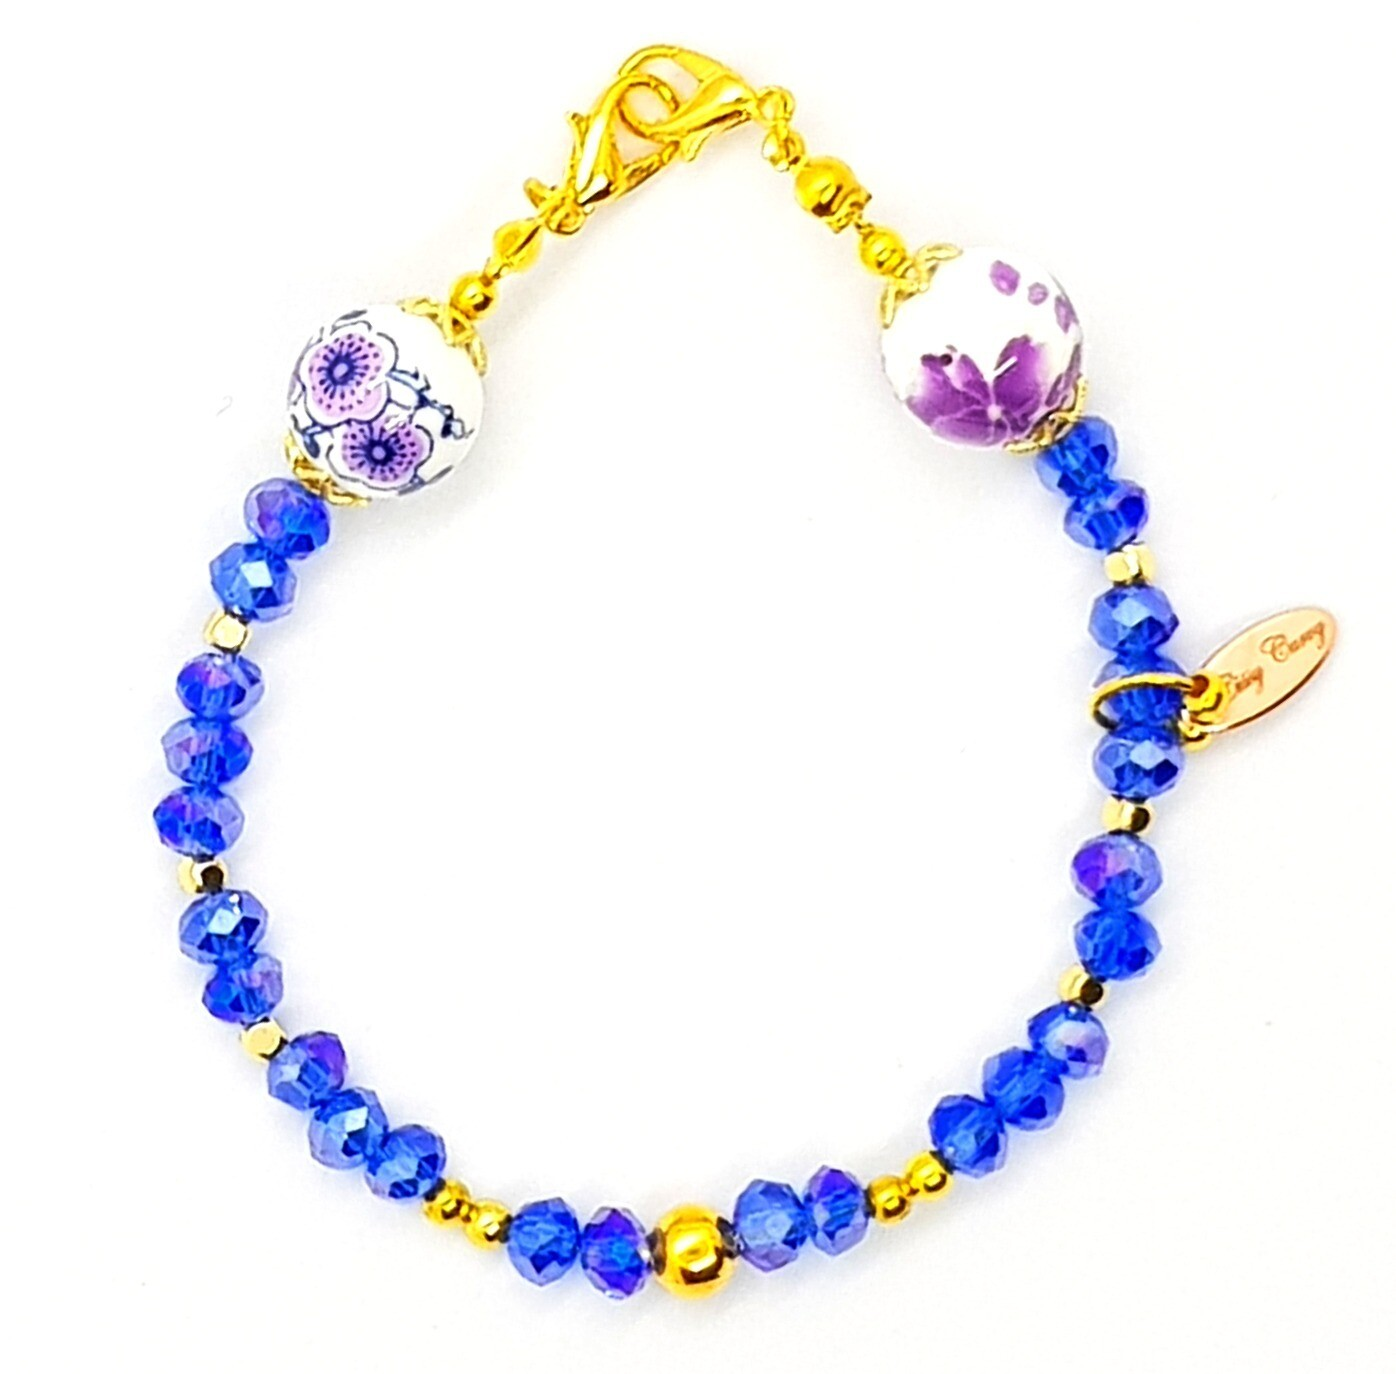 Bracelet & Face Mask Extender Dual Function (Aoiumi - Crystal Czech Beads)